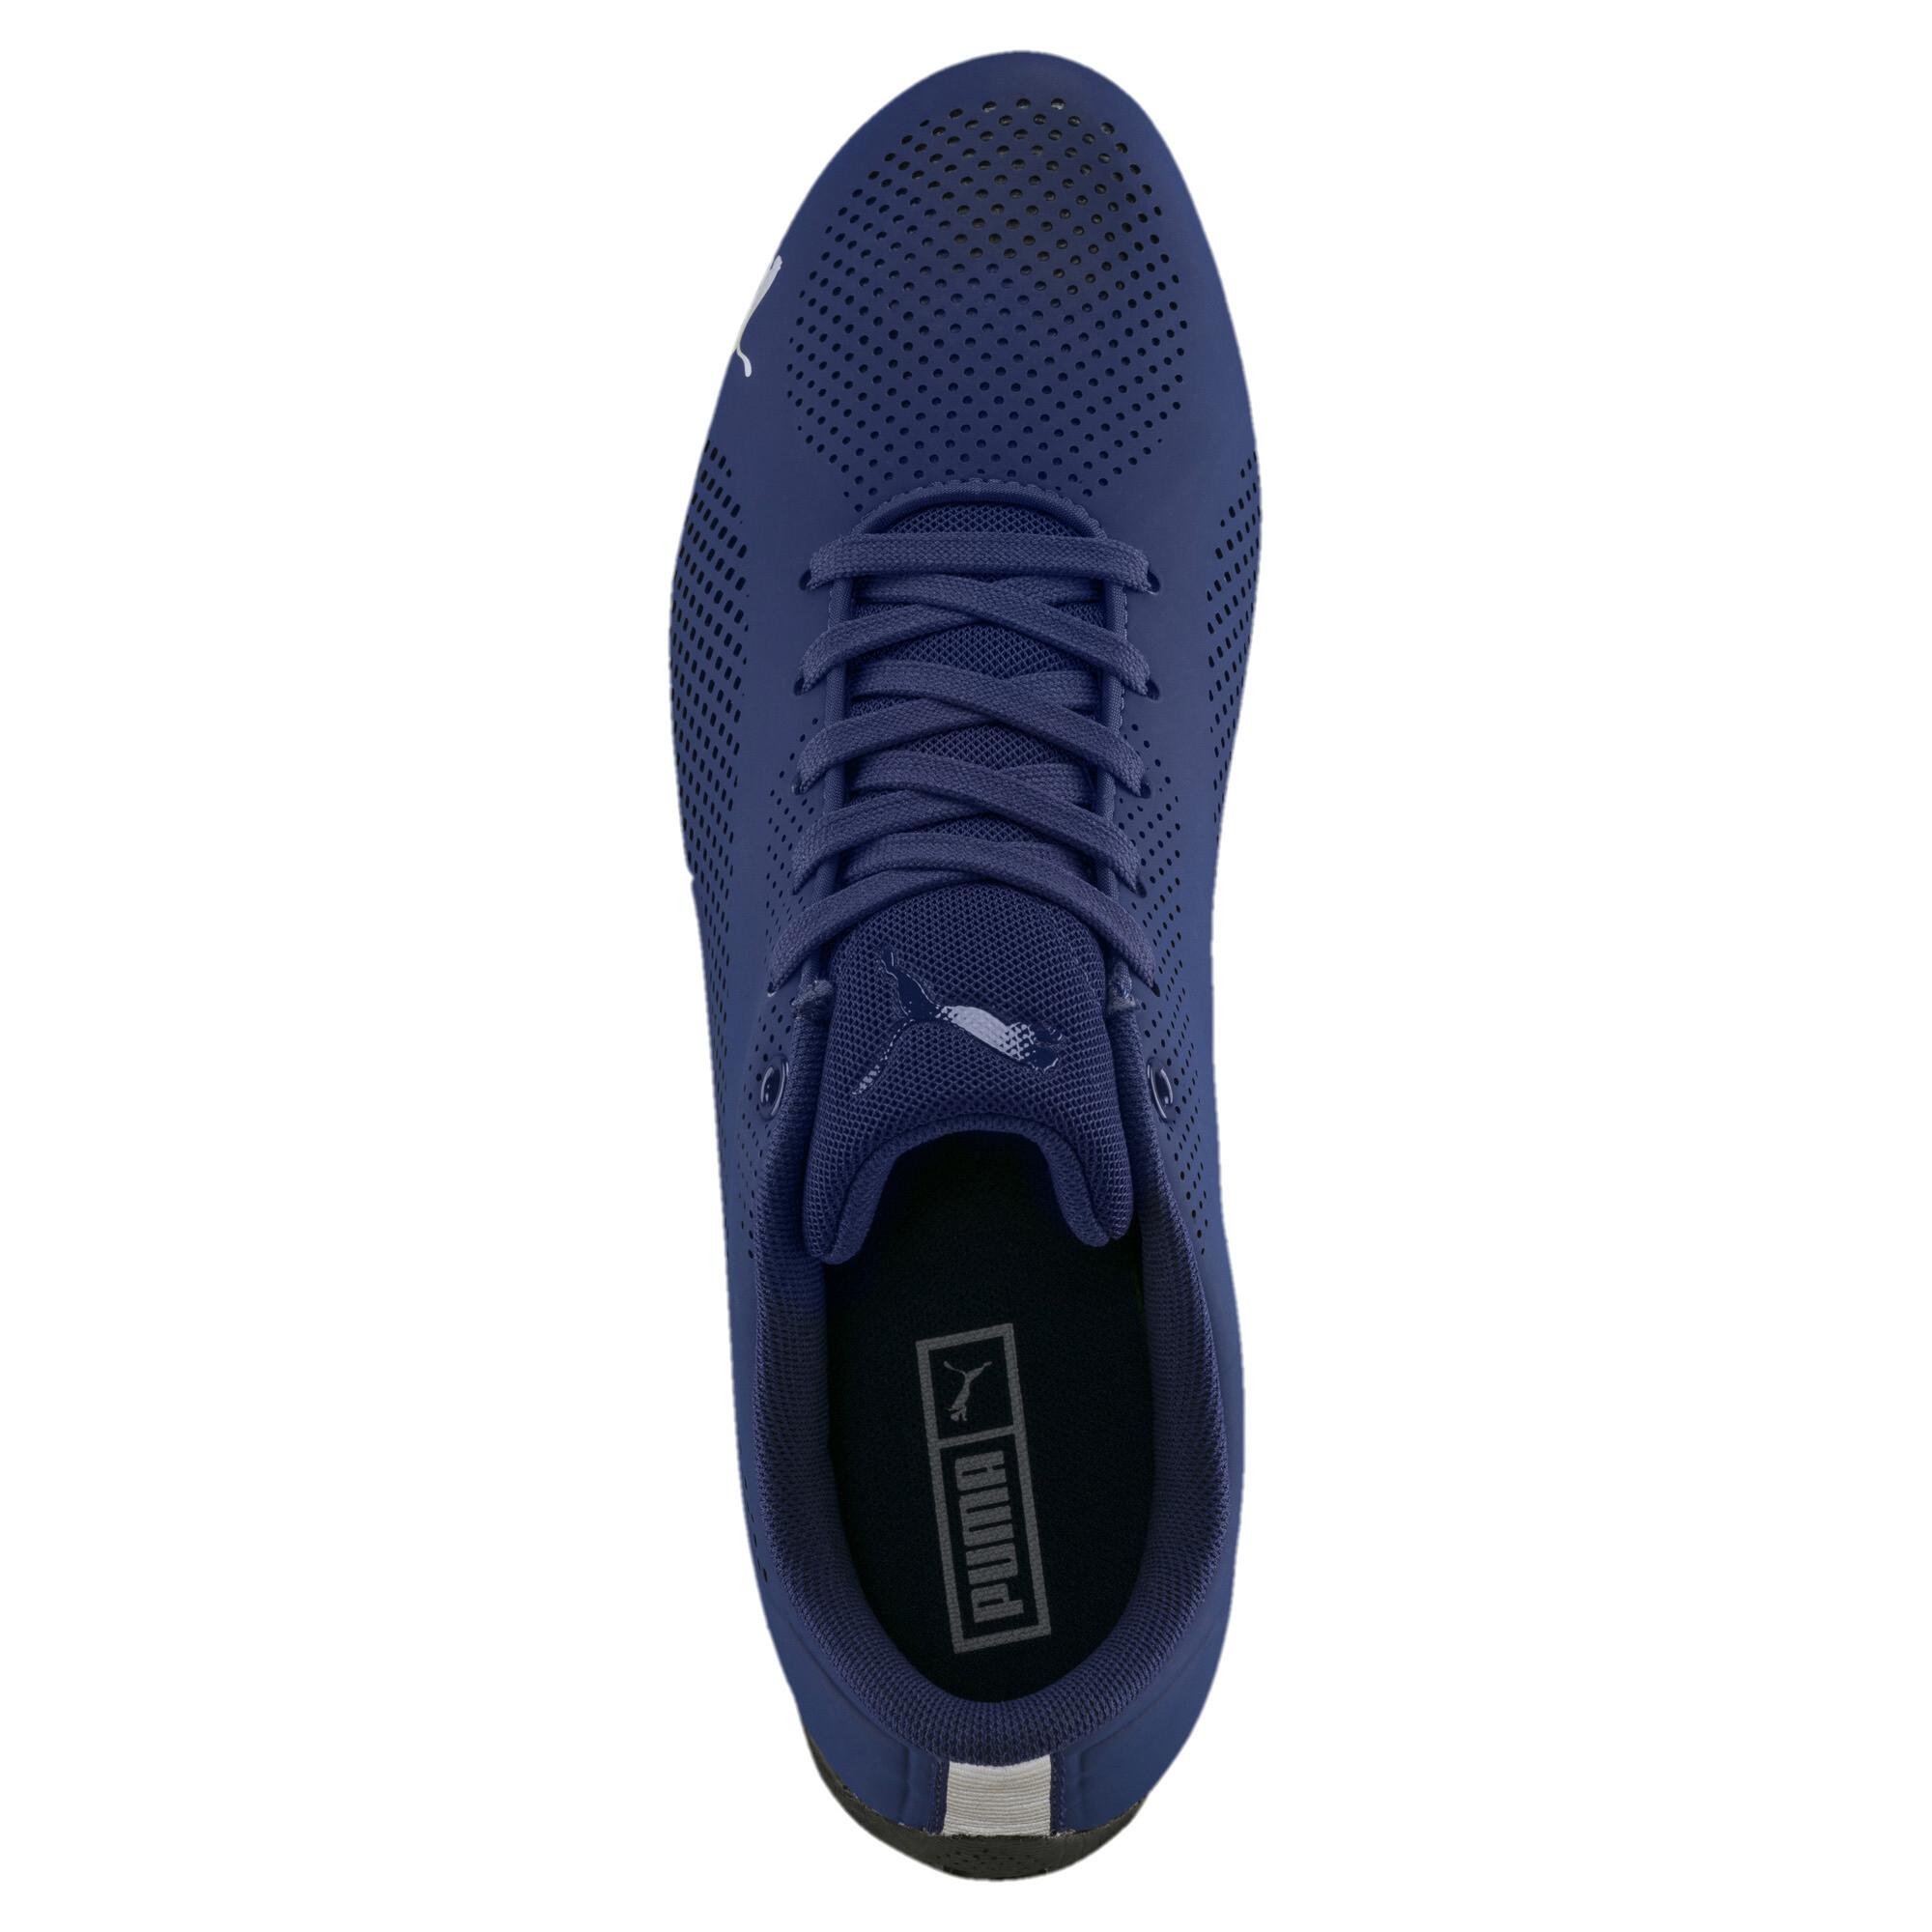 PUMA-Men-039-s-Drift-Cat-Ultra-Reflective-Shoes thumbnail 11